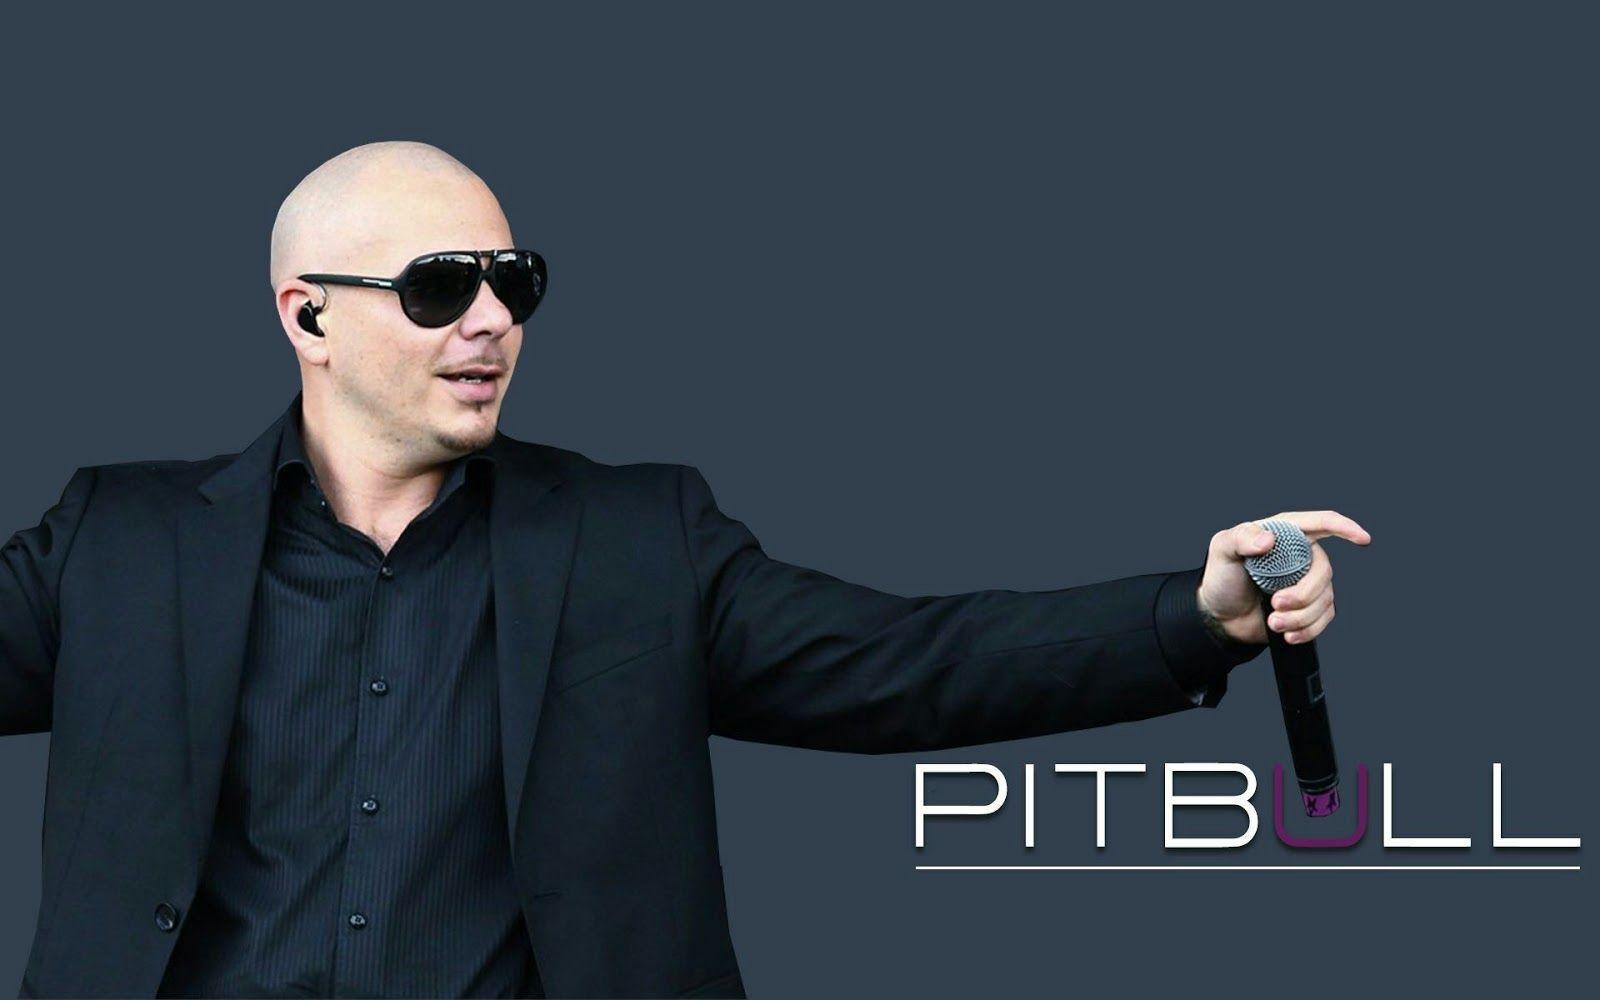 Download Top 10 Best Pitbull Song Armando christian